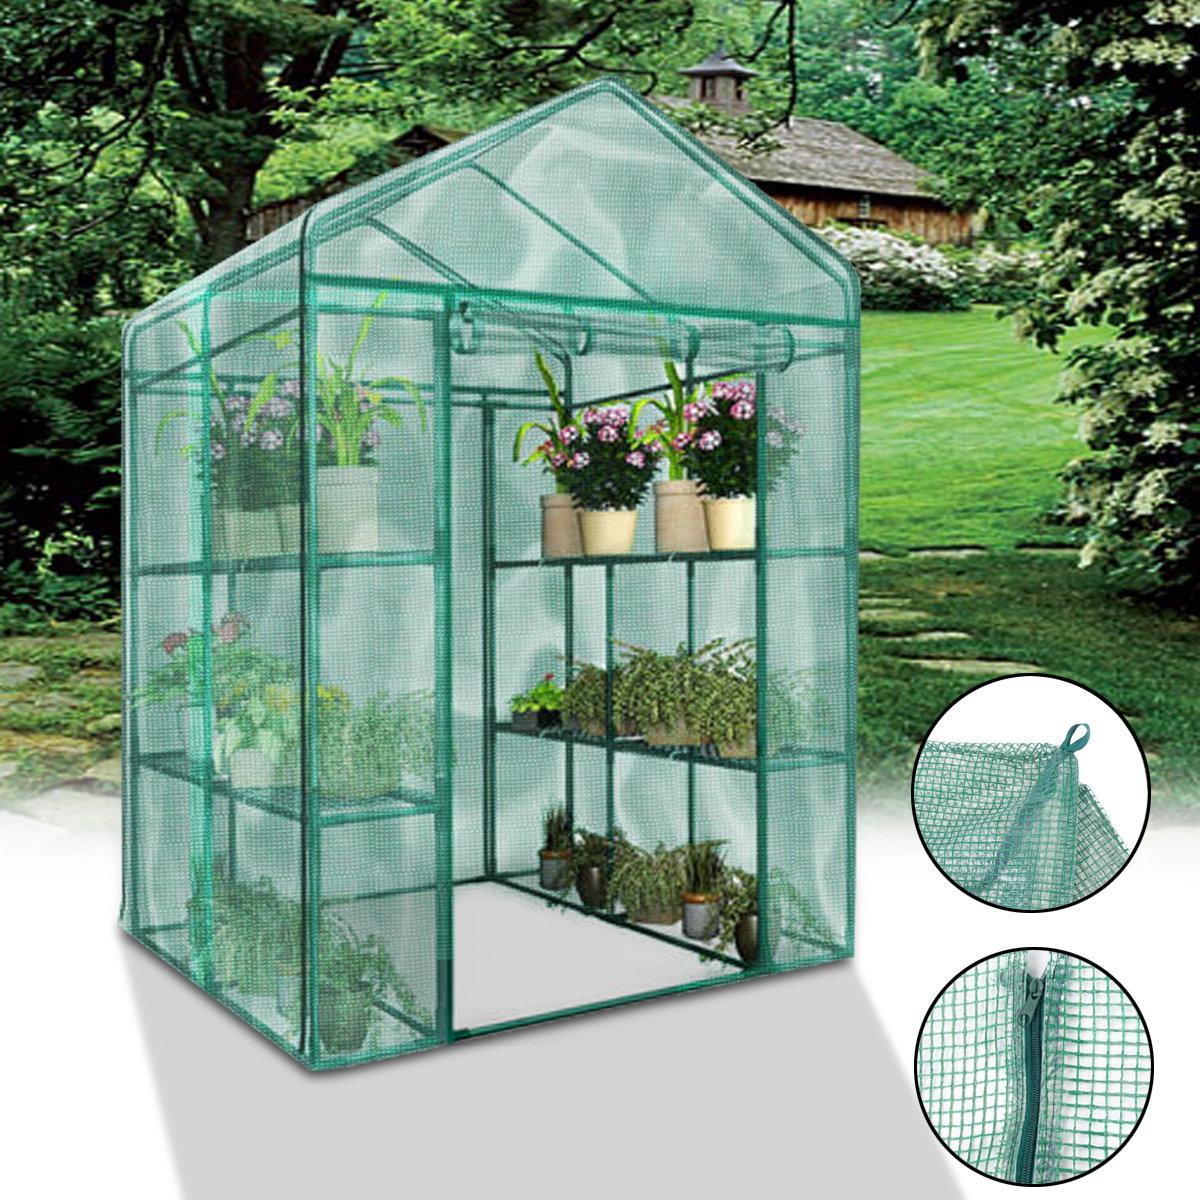 Garden Greenhouse Walk-In Green Hot Plant House Armazém Armazém PE Cover Apex Roof